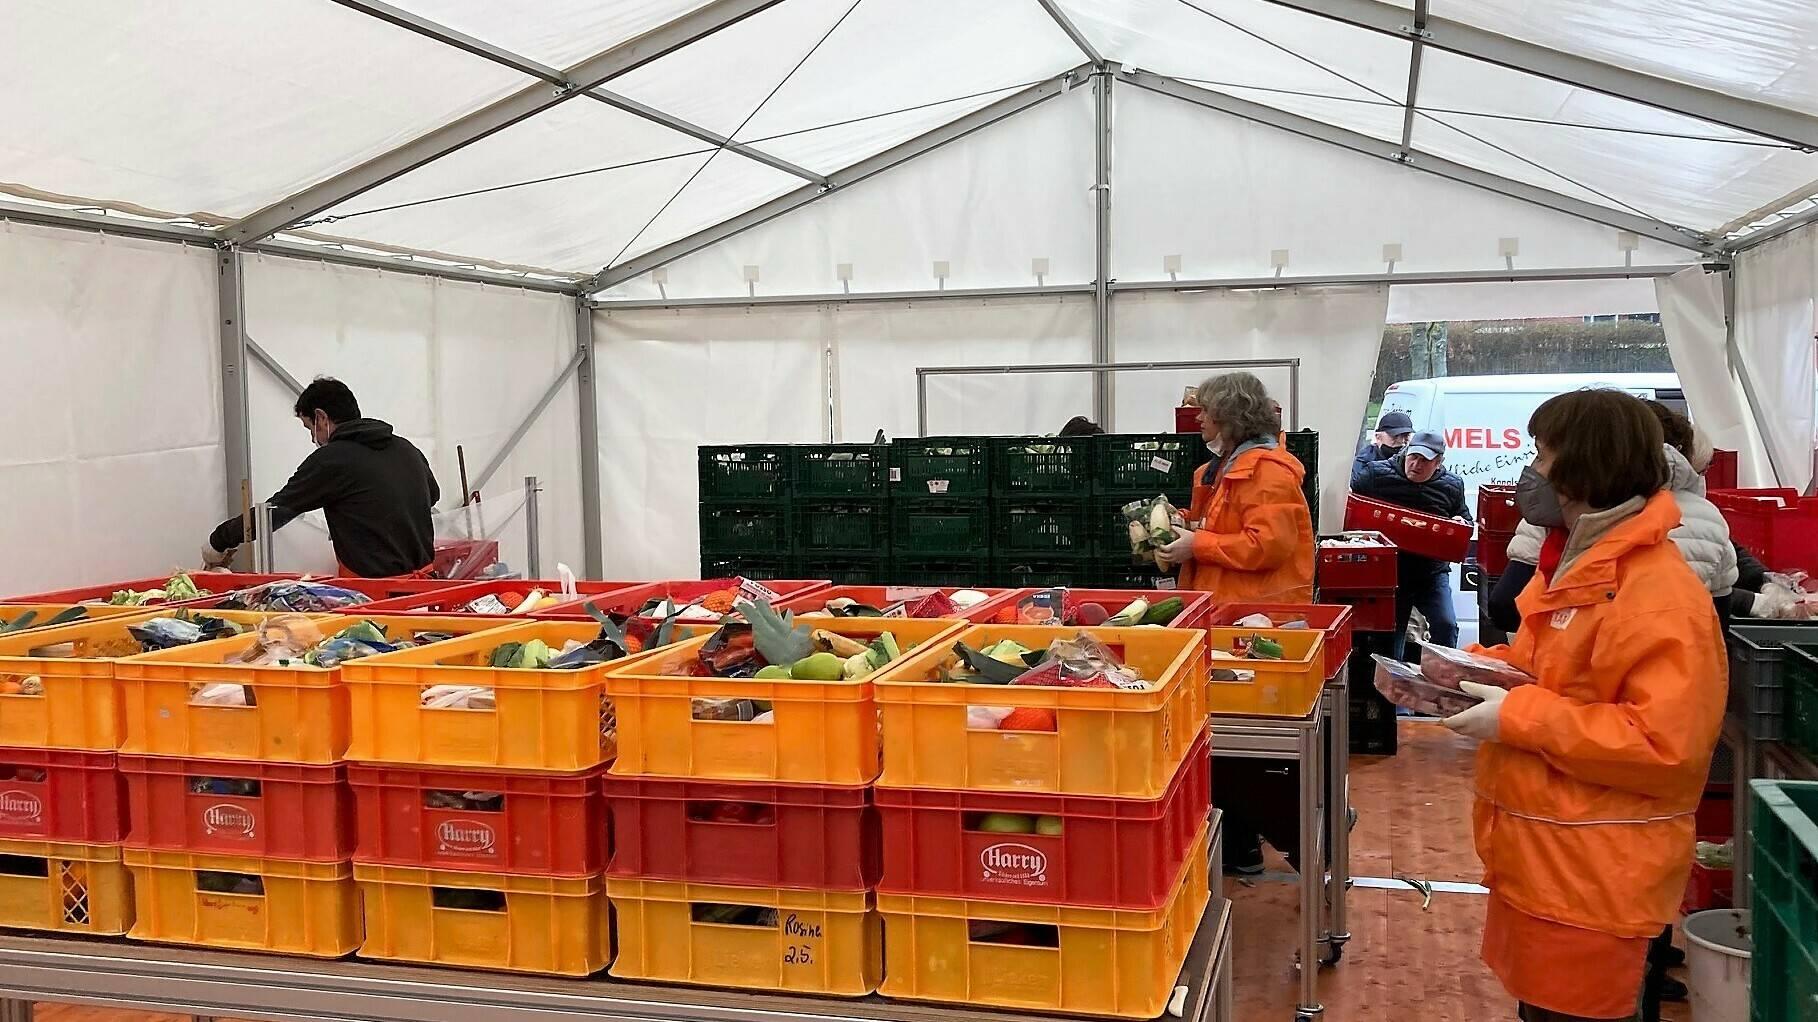 Lebensmittelkosten Pro Monat 4 Personen